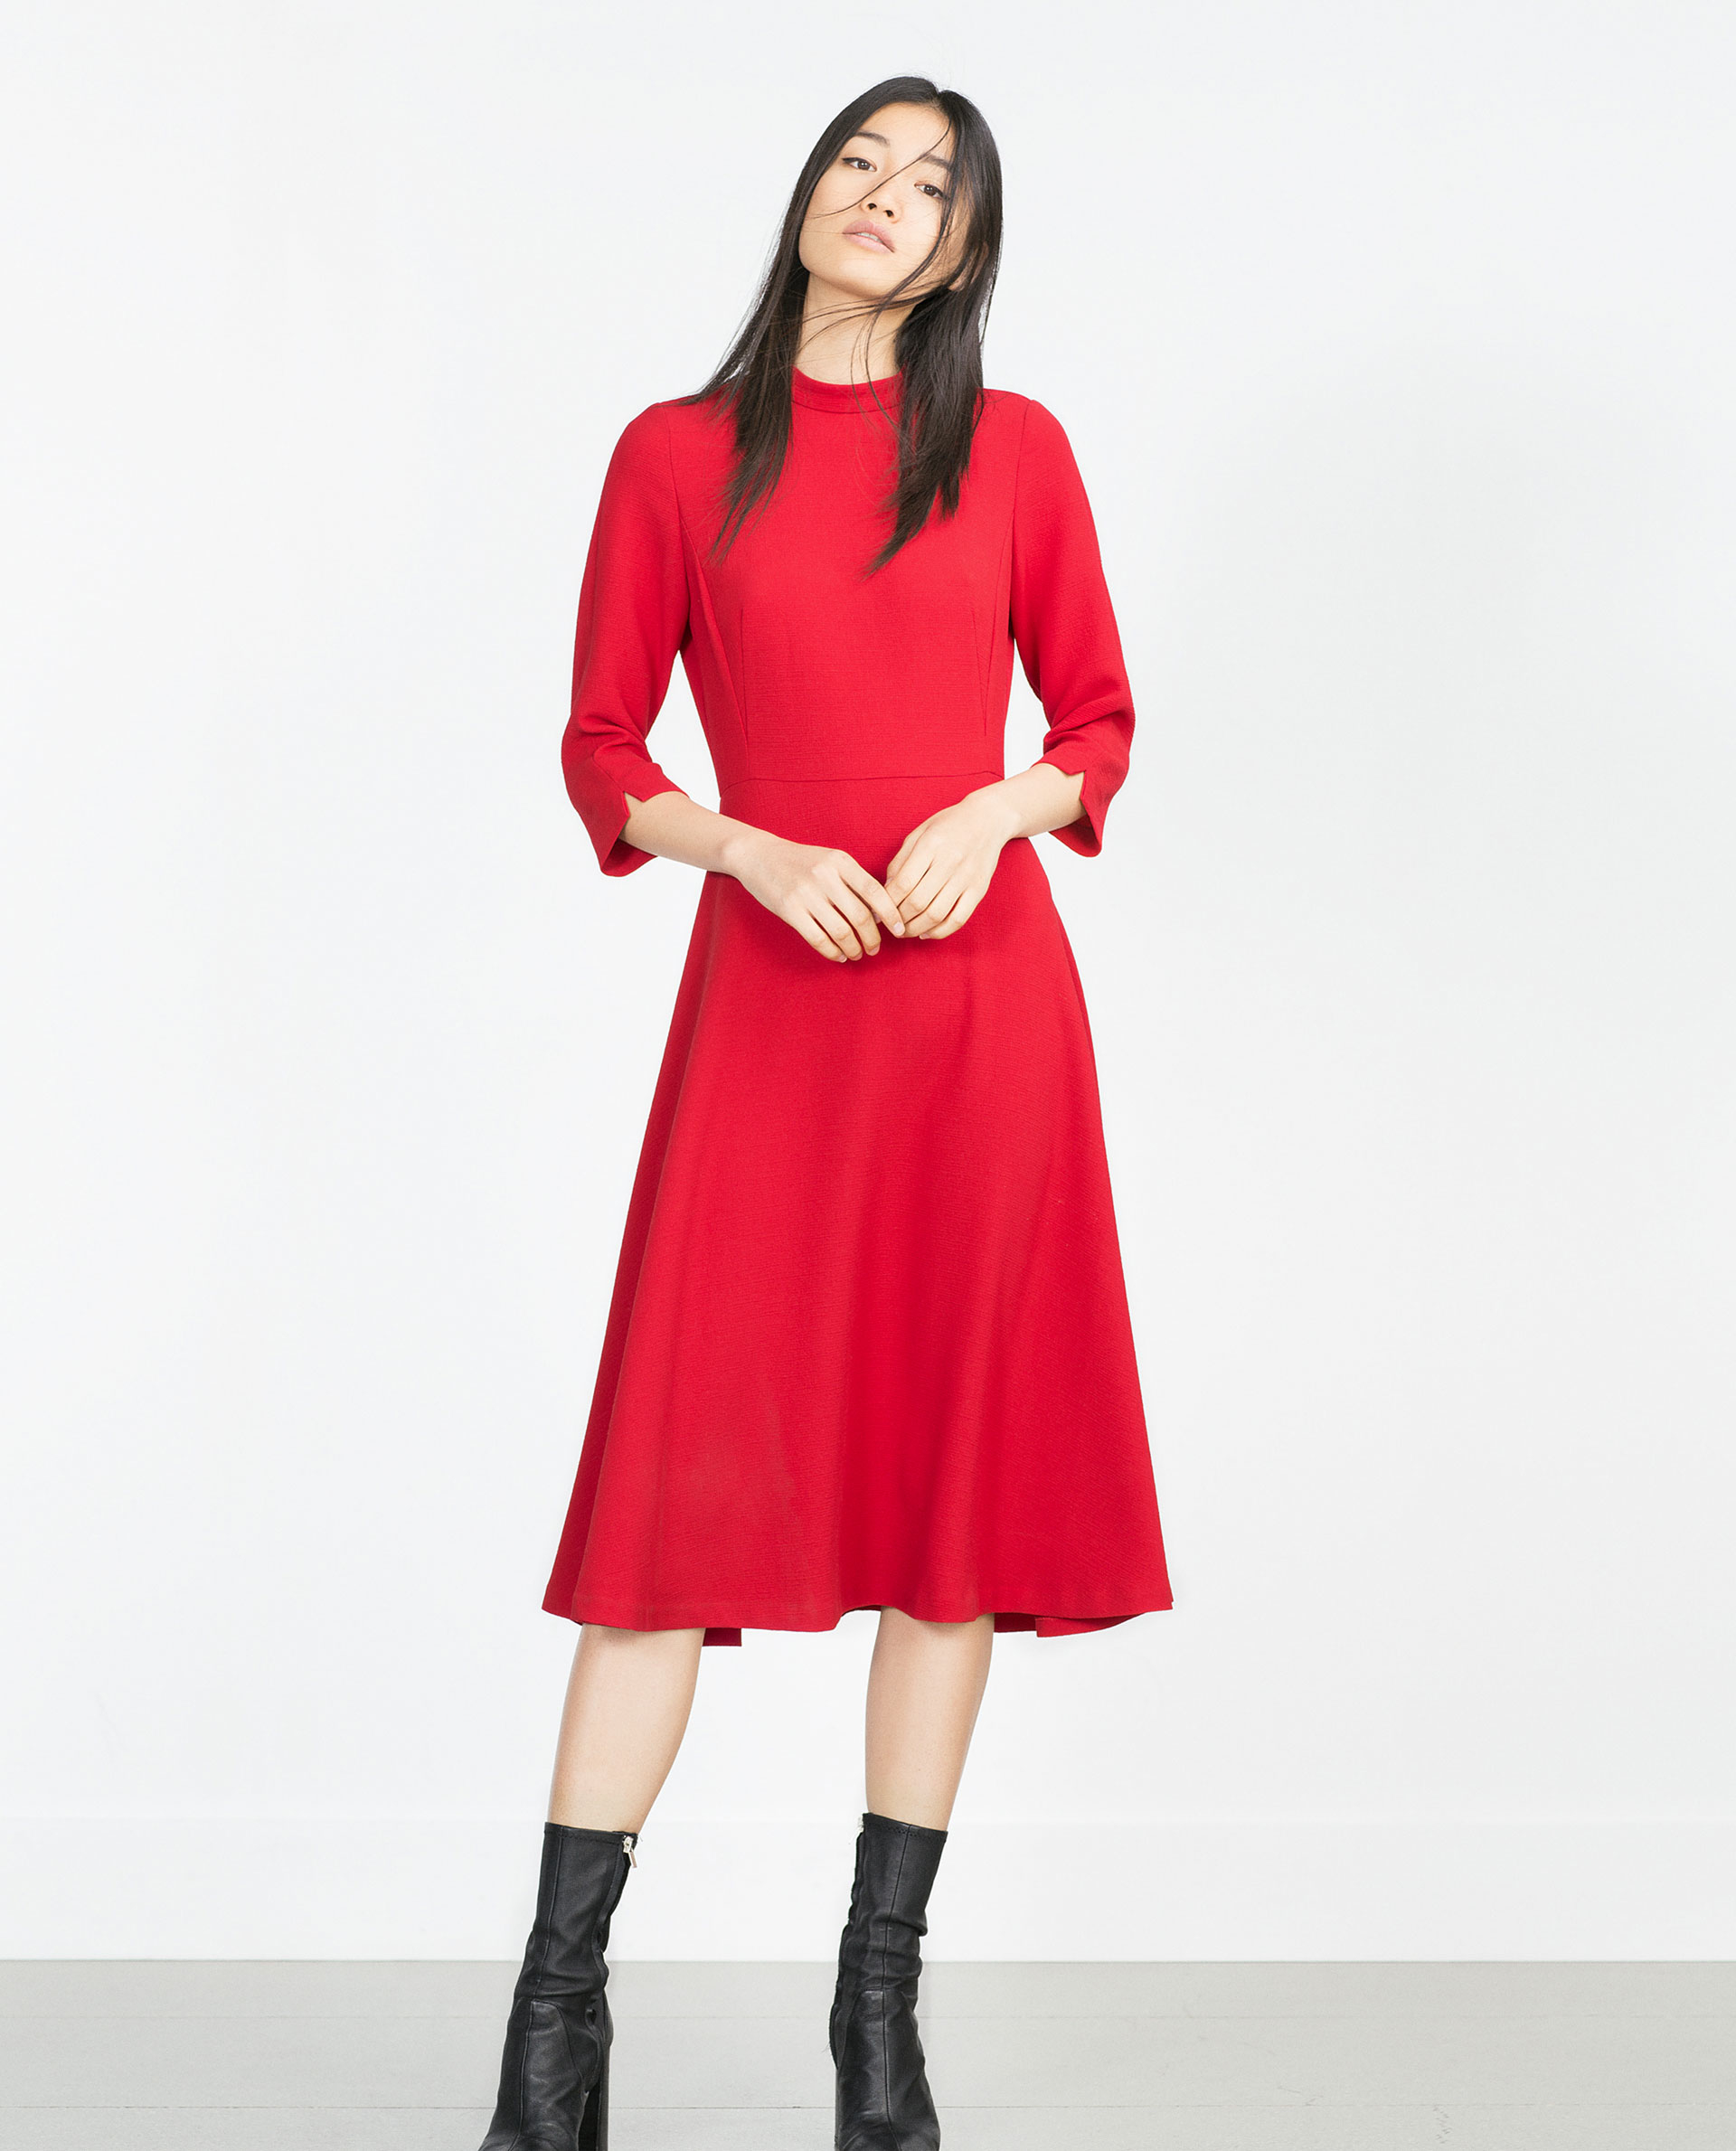 Zara High Neck Dress in Red - Lyst